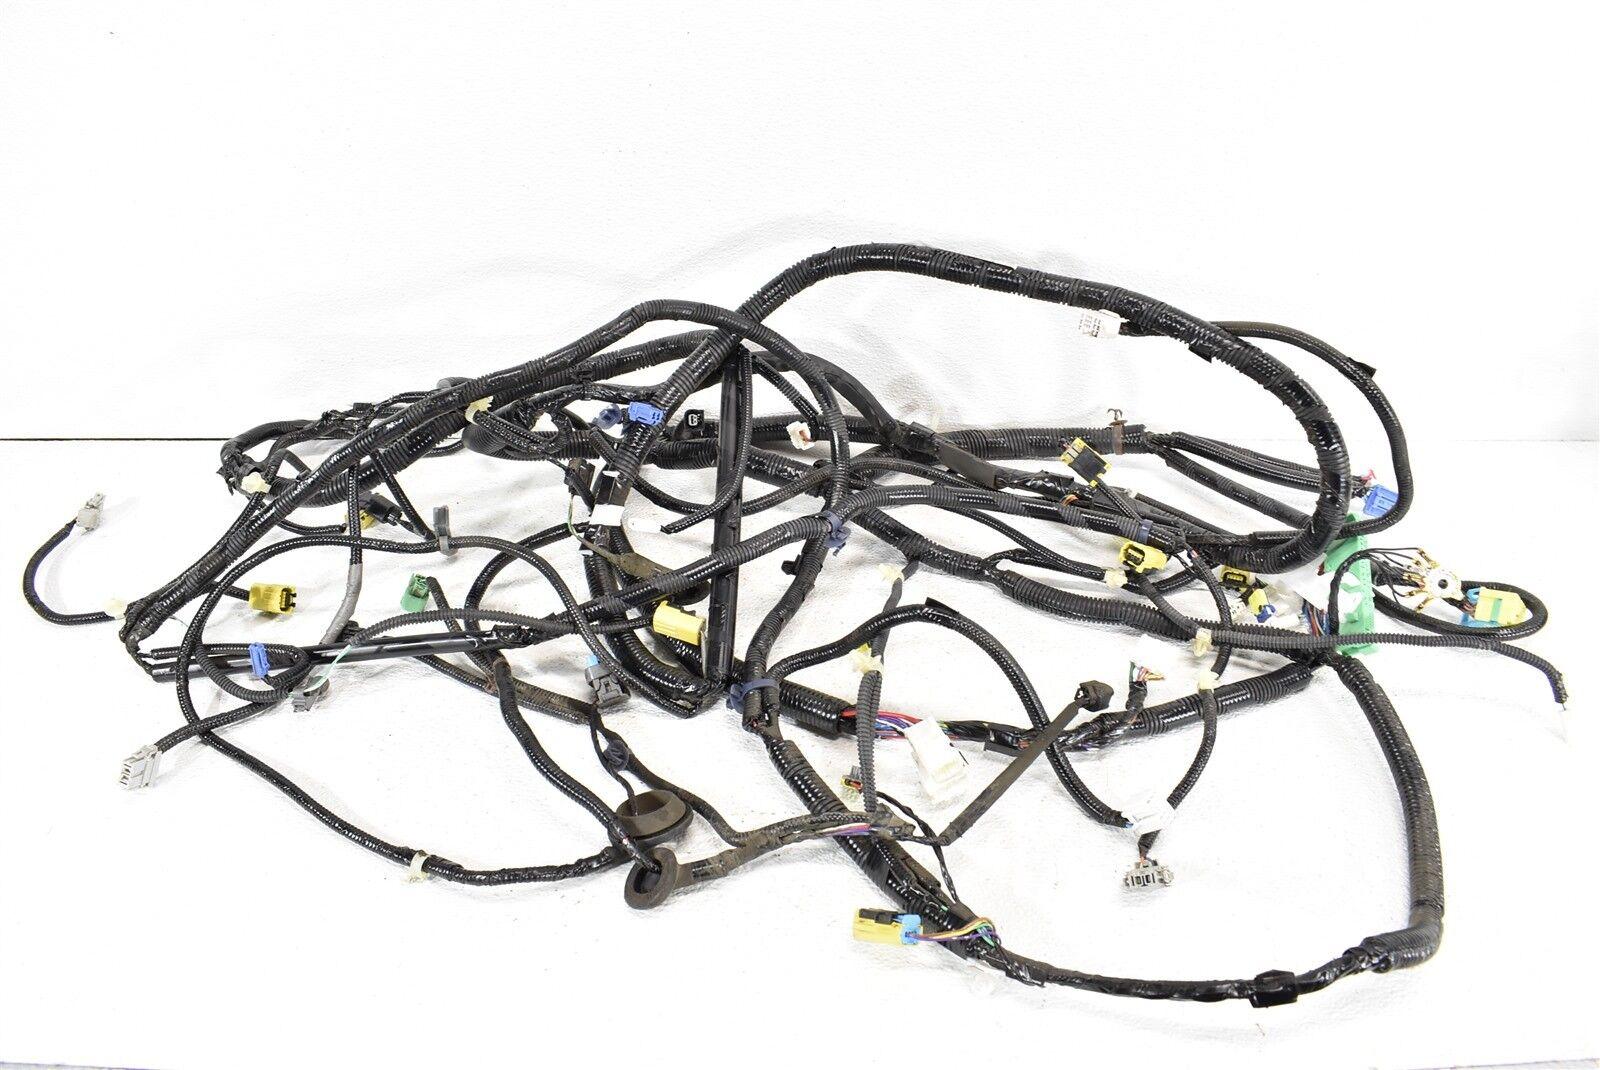 2012-2015 Honda Civic Si Floor Wire Harness Wiring 32107-tr7-a124 Sedan  12-15 | eBayeBay